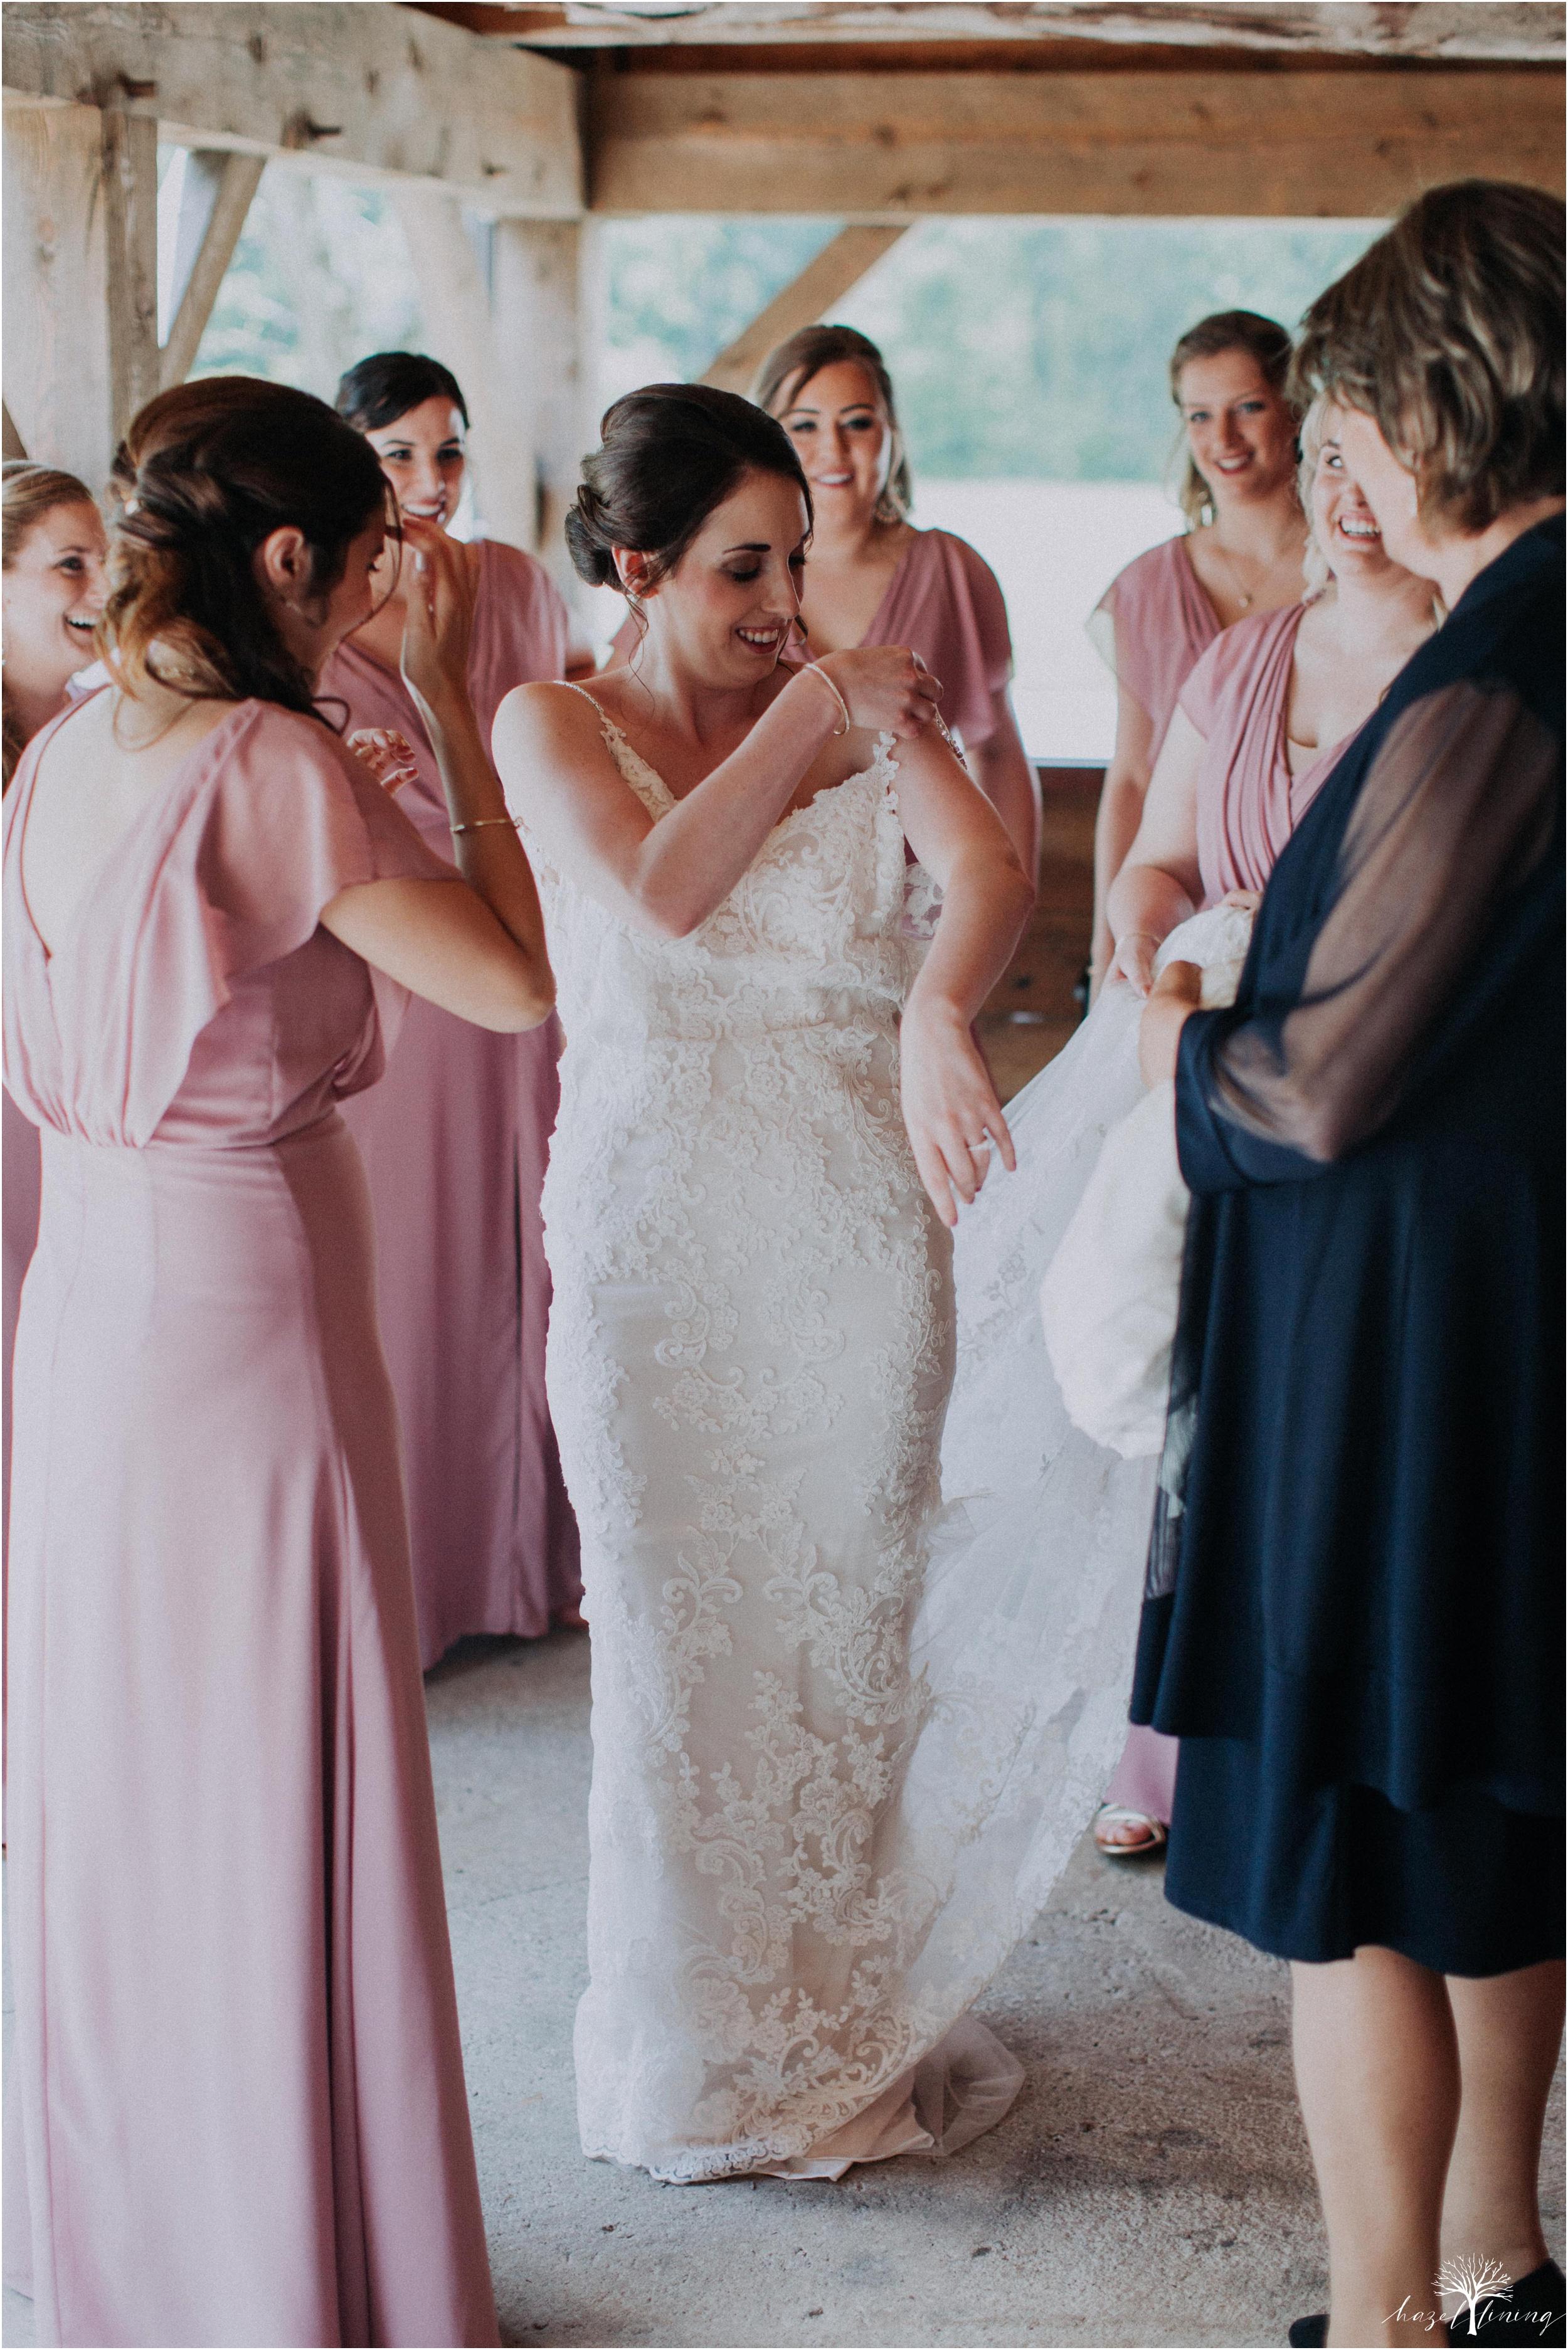 hazel-lining-travel-wedding-elopement-photography-lisa-landon-shoemaker-the-farm-bakery-and-events-bucks-county-quakertown-pennsylvania-summer-country-outdoor-farm-wedding_0008.jpg